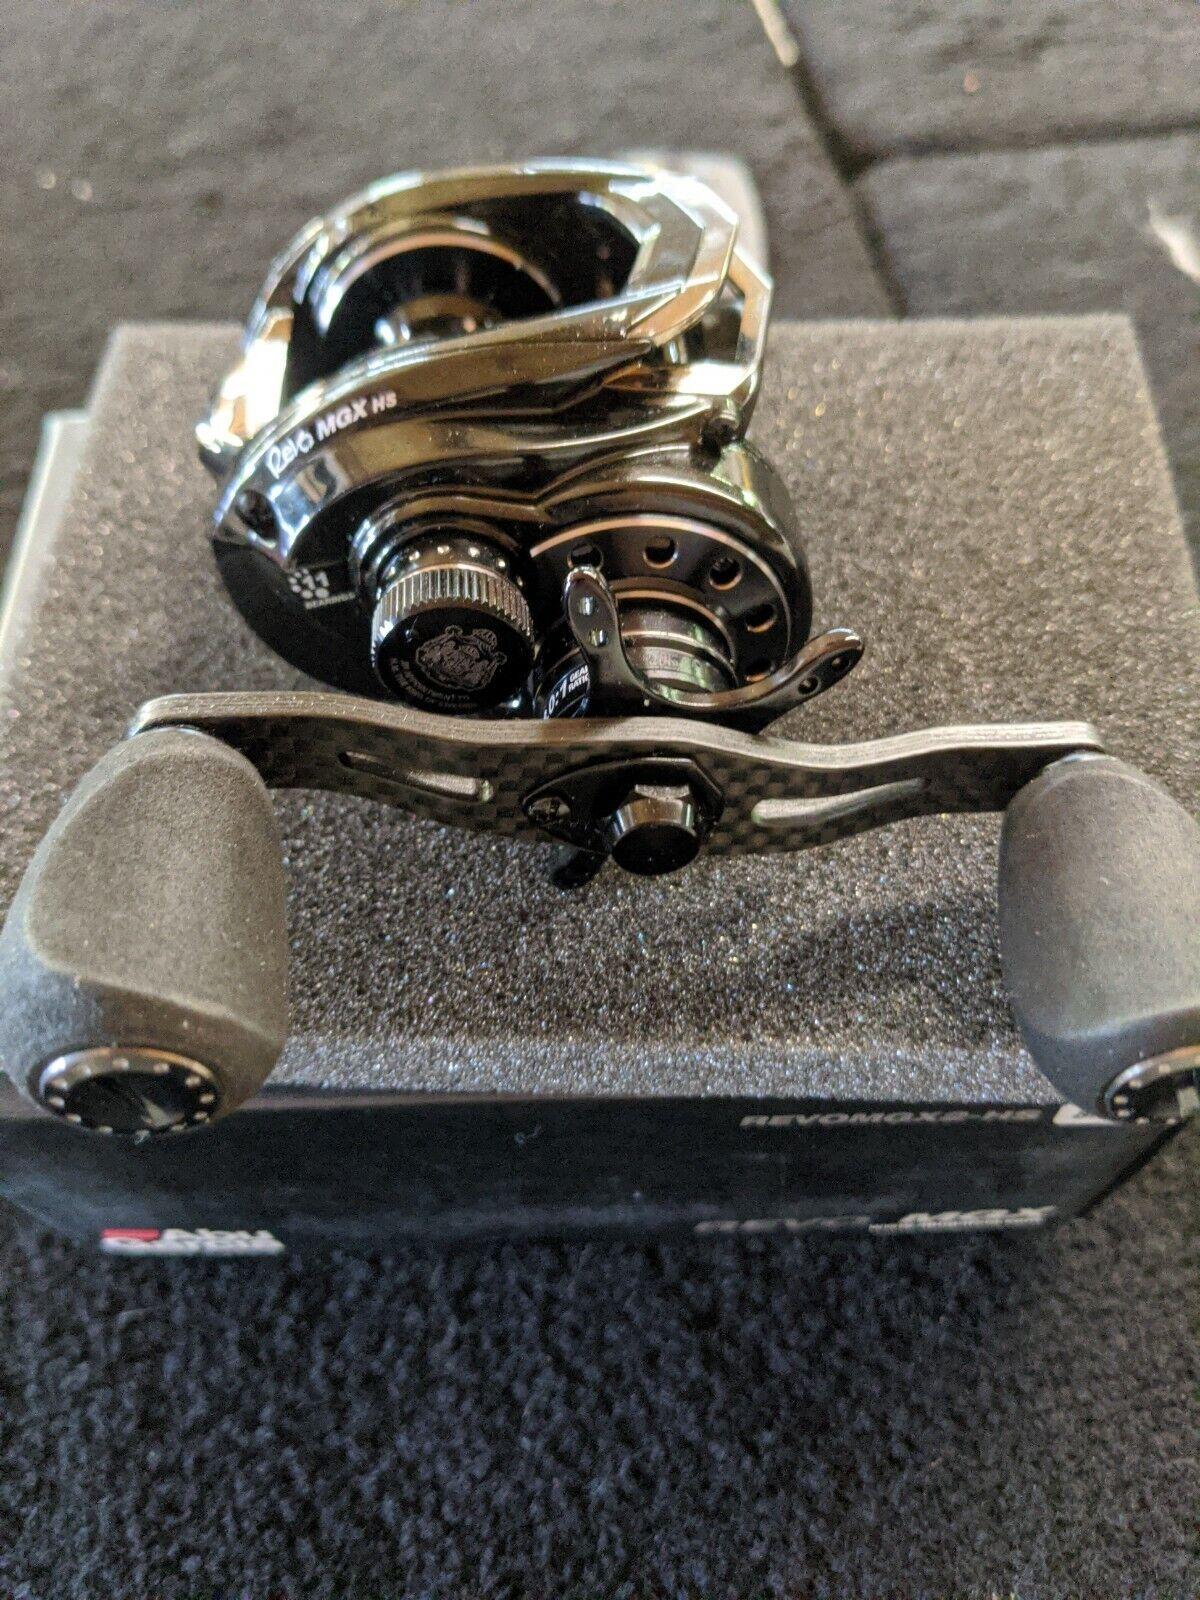 Abu Garcia Revo MGX 2 Left Hand Low Profile Baitcaster Reel for sale online